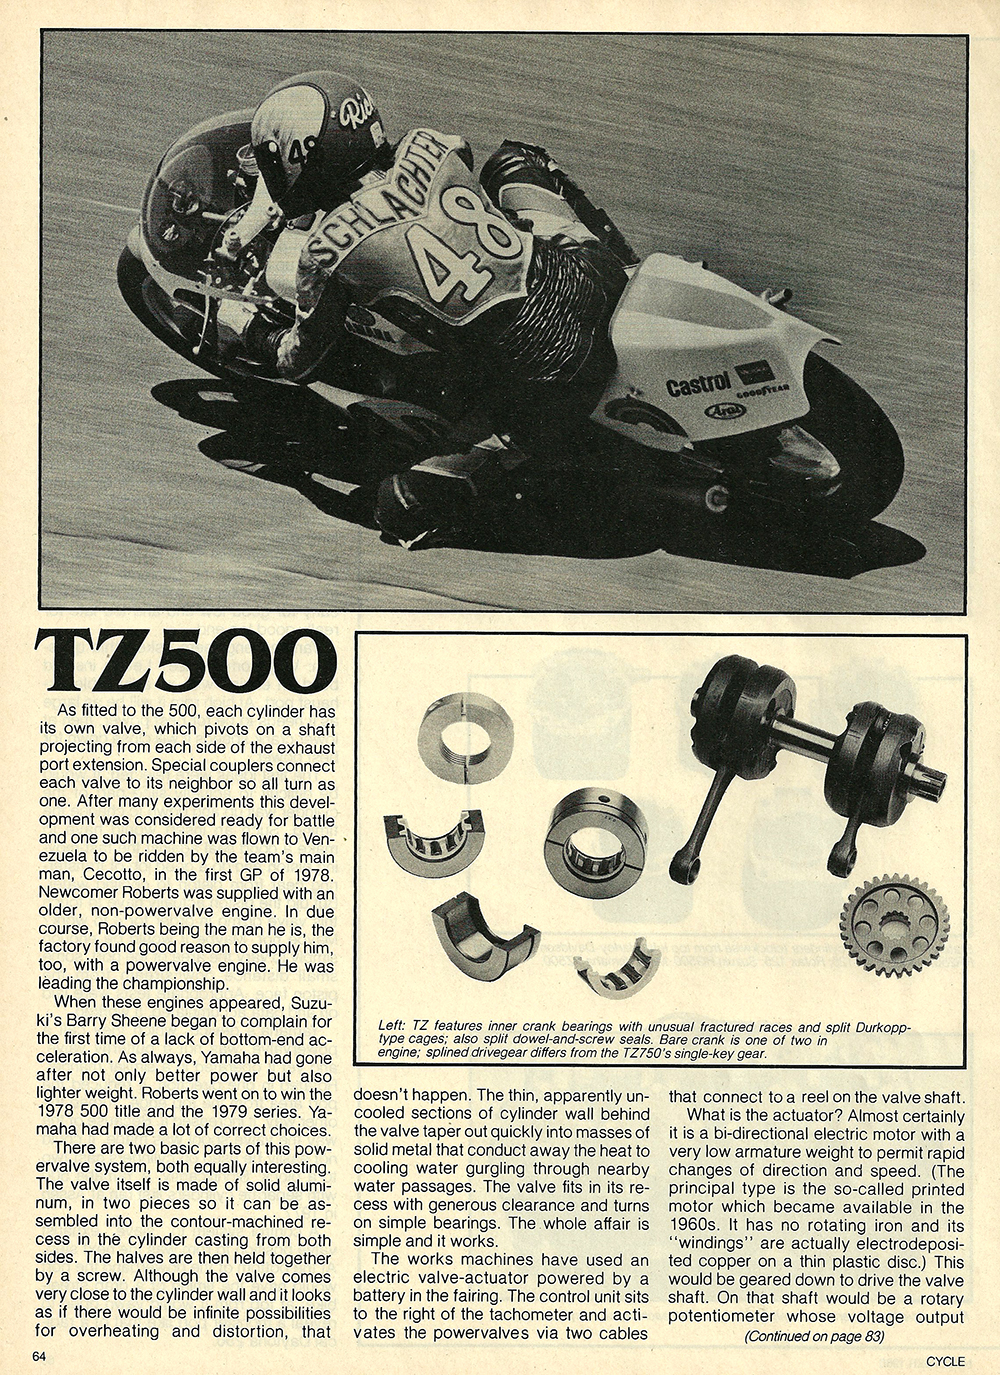 1980 Yamaha TZ500 test 05.jpg